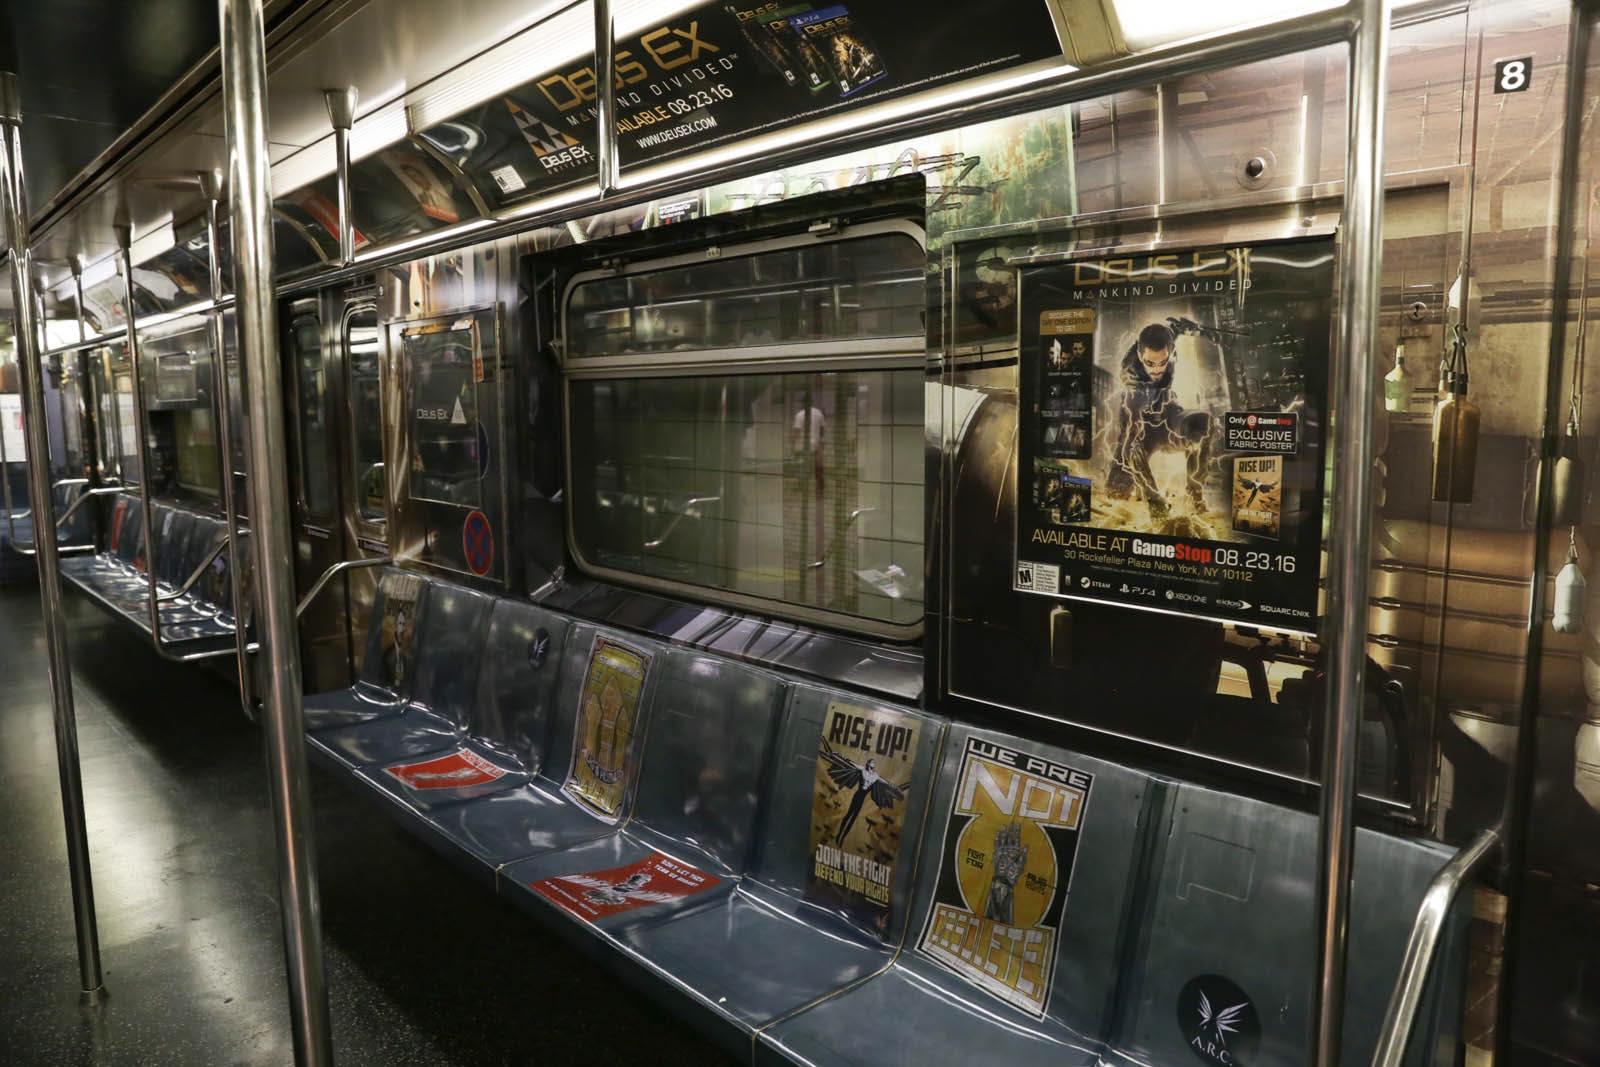 New Yorkem se prohání vlak metra s motivy Deus Ex: Mankind Divided 128576